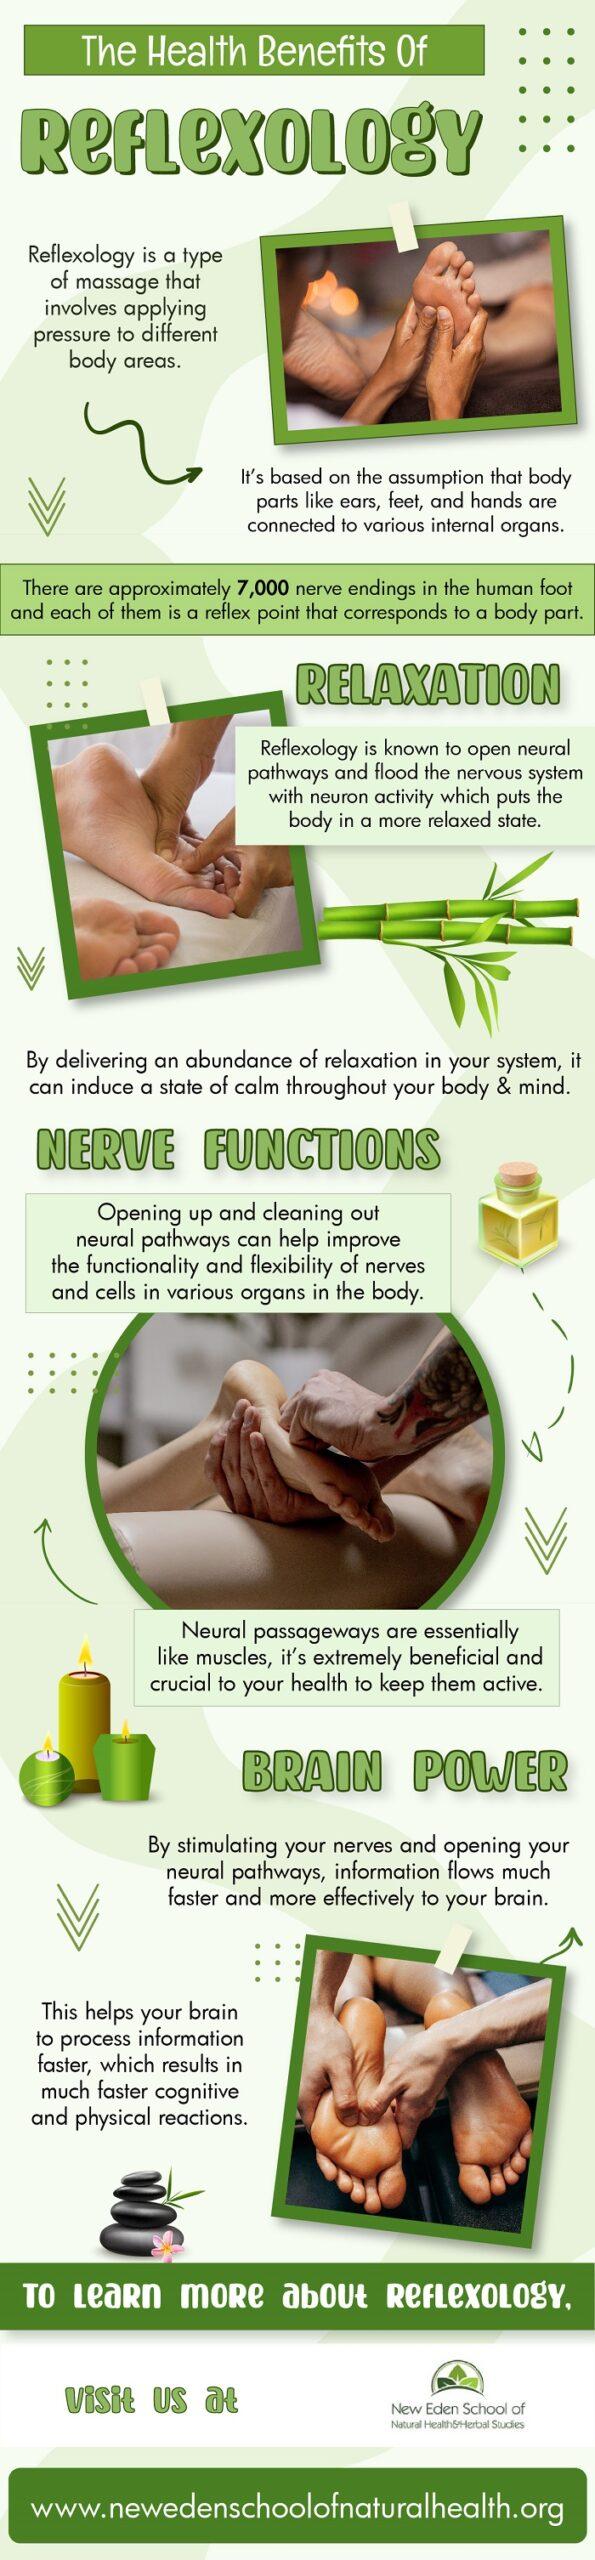 The Health Benefits of Reflexology